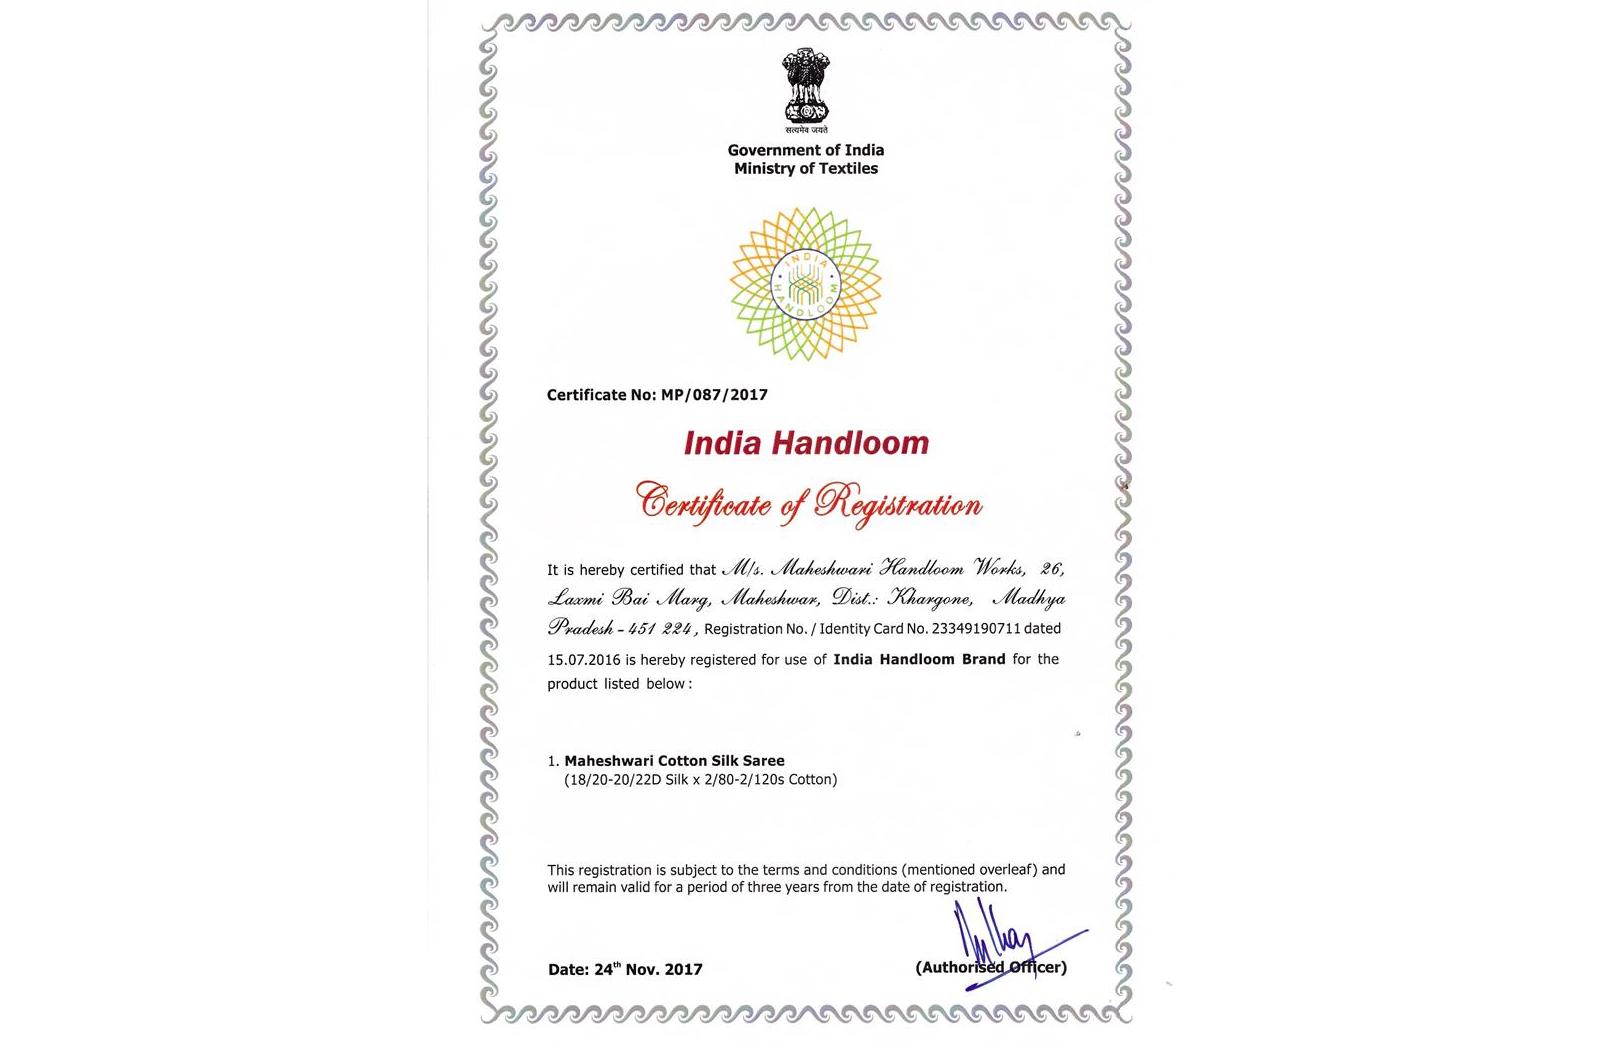 India Handloom Brand-Maheshwari Handloom Works